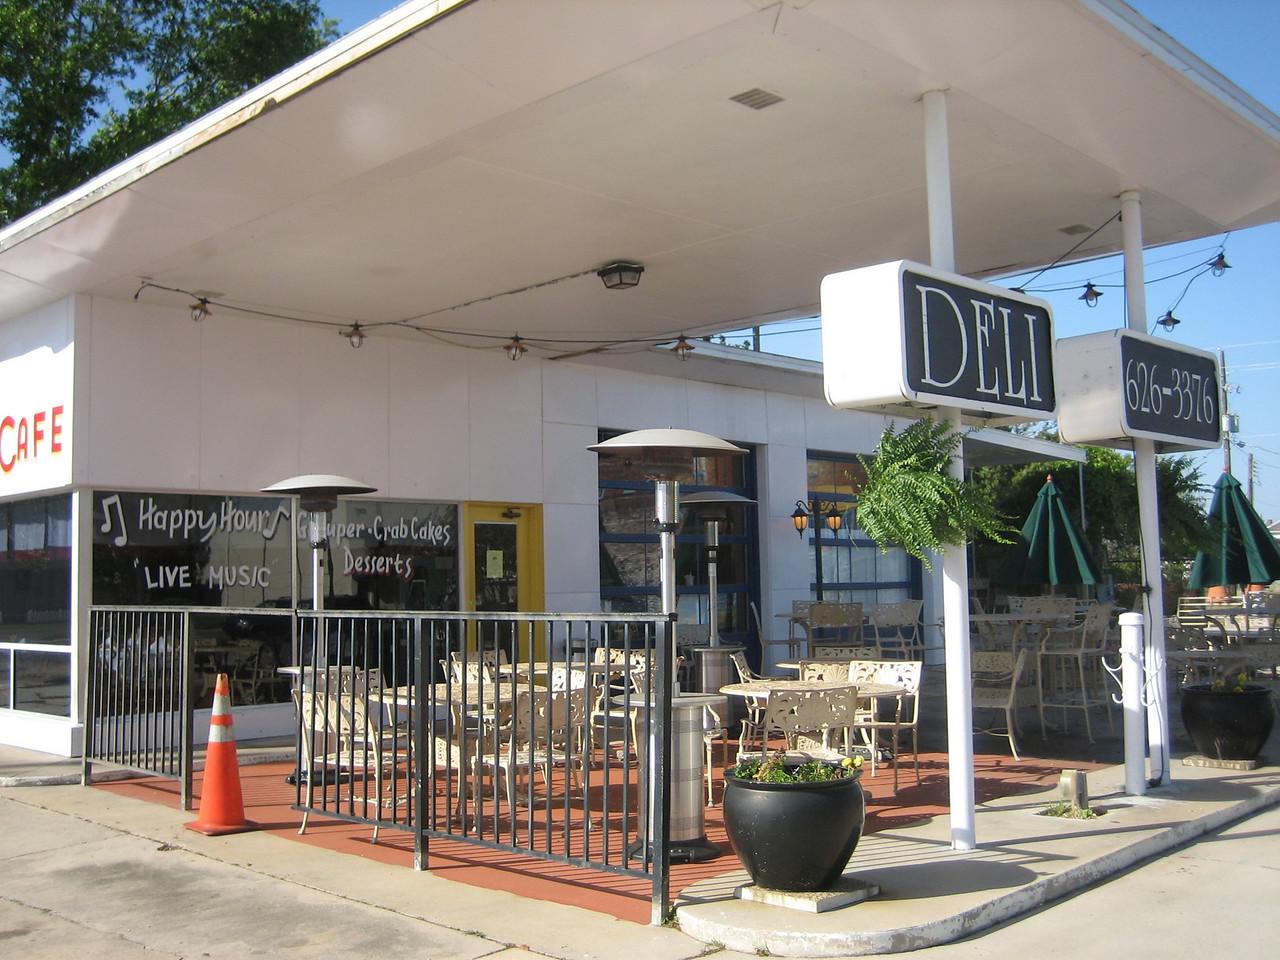 Cafe Deli in downtown Milton<br /> PHOTO CREDIT: Sandra Friend / Florida Trail Association